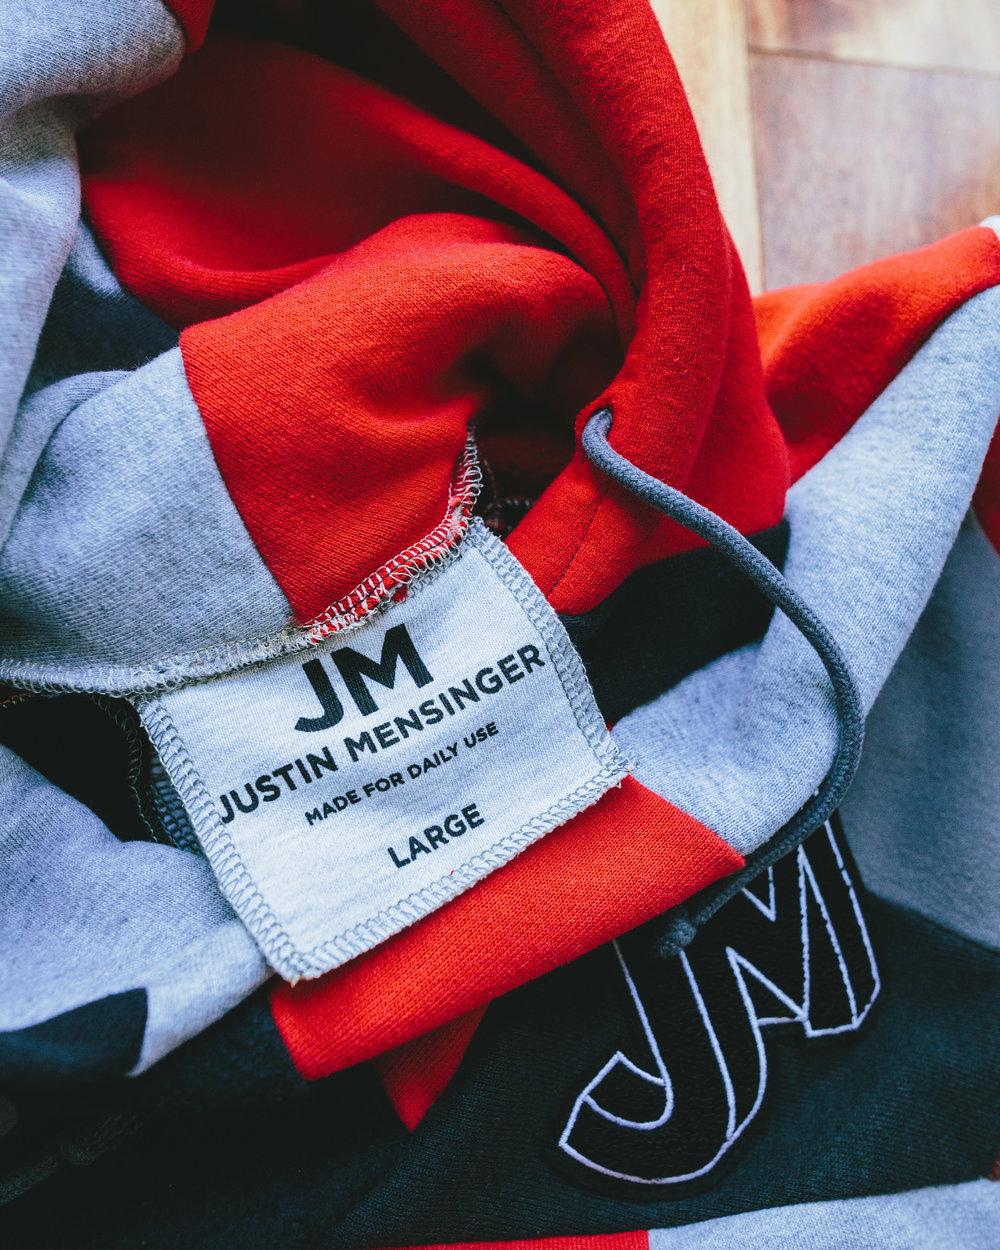 jmsweater-1006.jpg